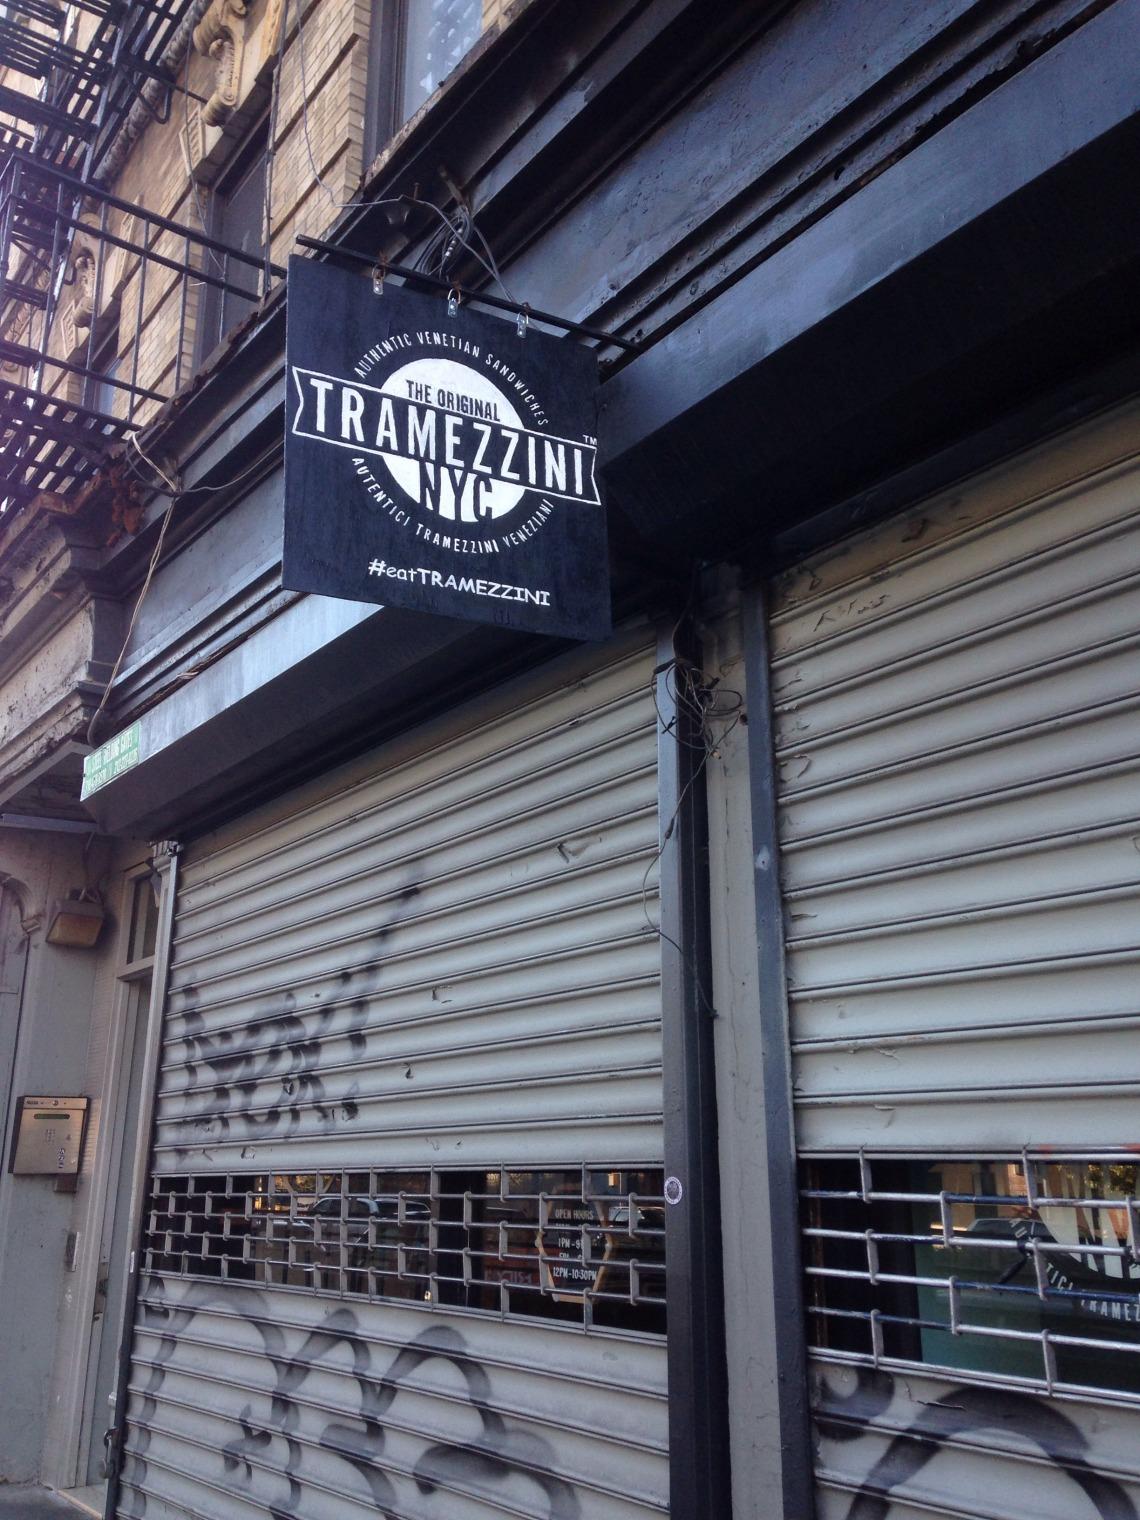 Houston street_s newest sandwich shop, Tramezzini (photo credit_ Tanzim Ahmed, '18)